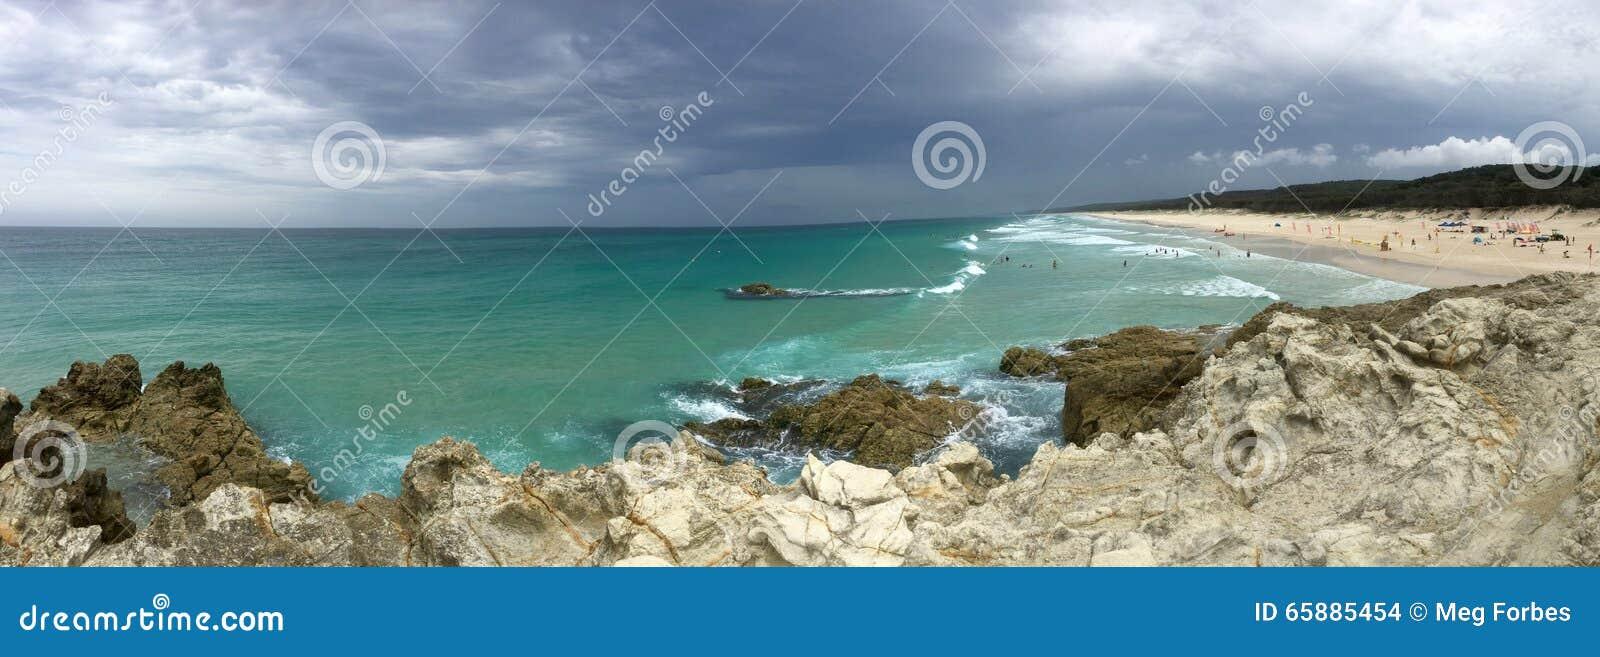 Australian beach storm